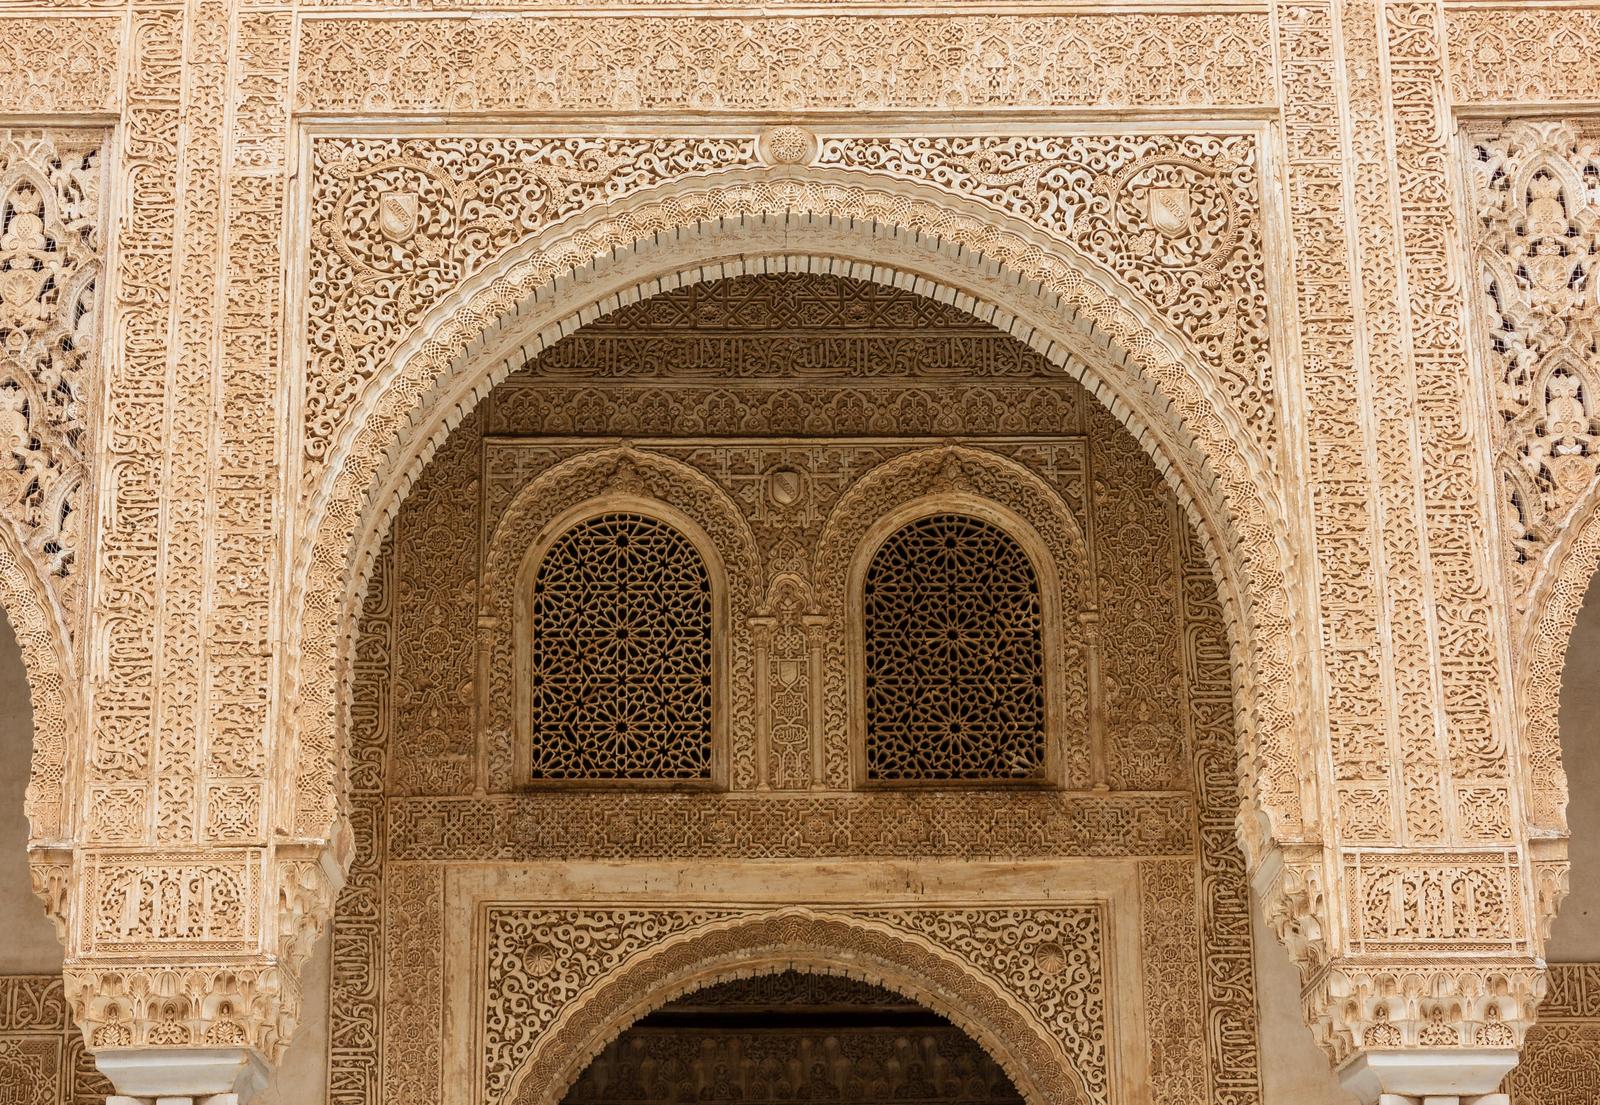 ARCHITECTURE ALHAMBRA PALACE